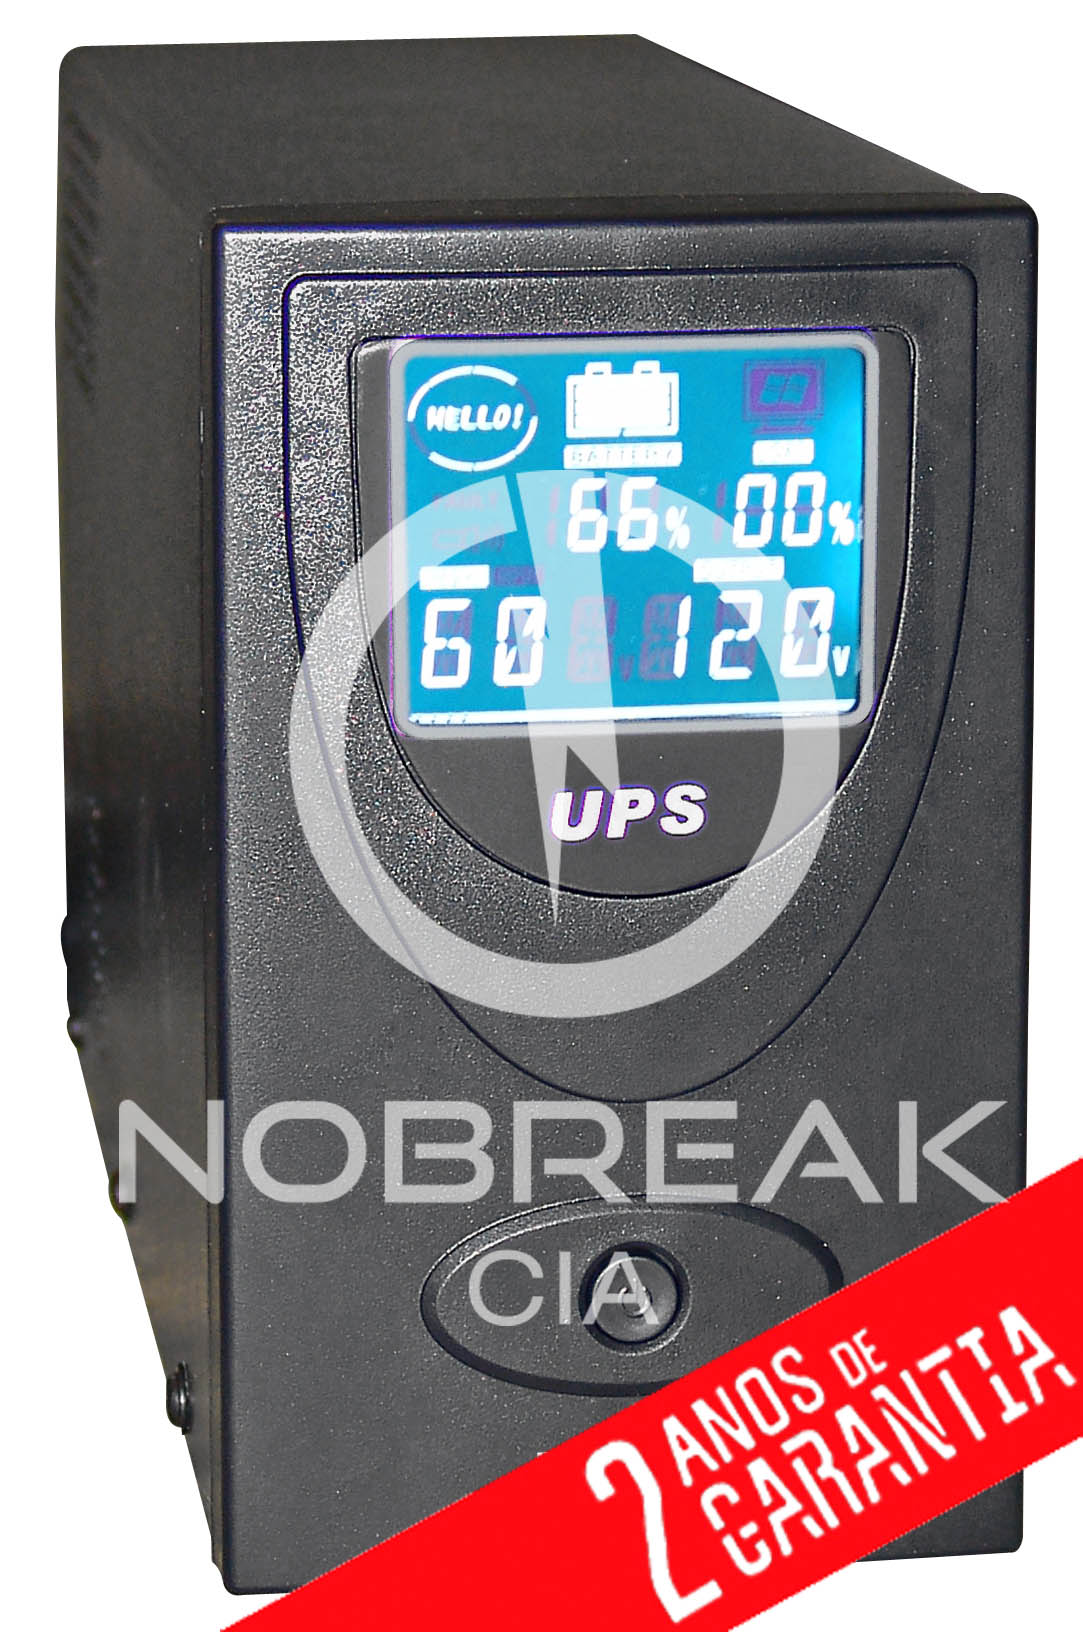 Nobreak AVR 1200 VA Senus